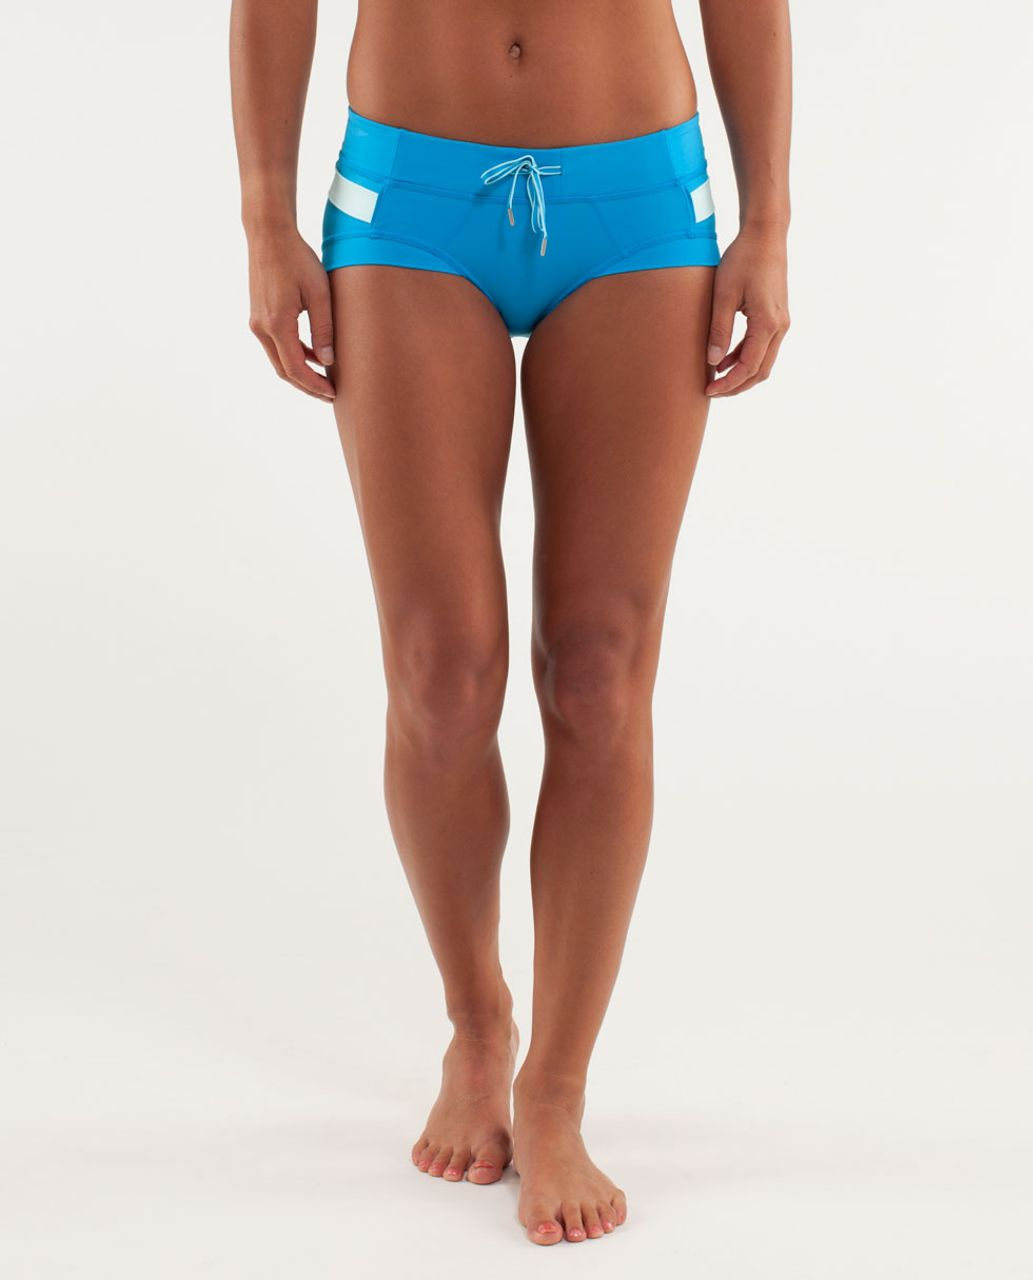 Lululemon Heat It Up Short - Beach Blanket Blue / Aquamarine